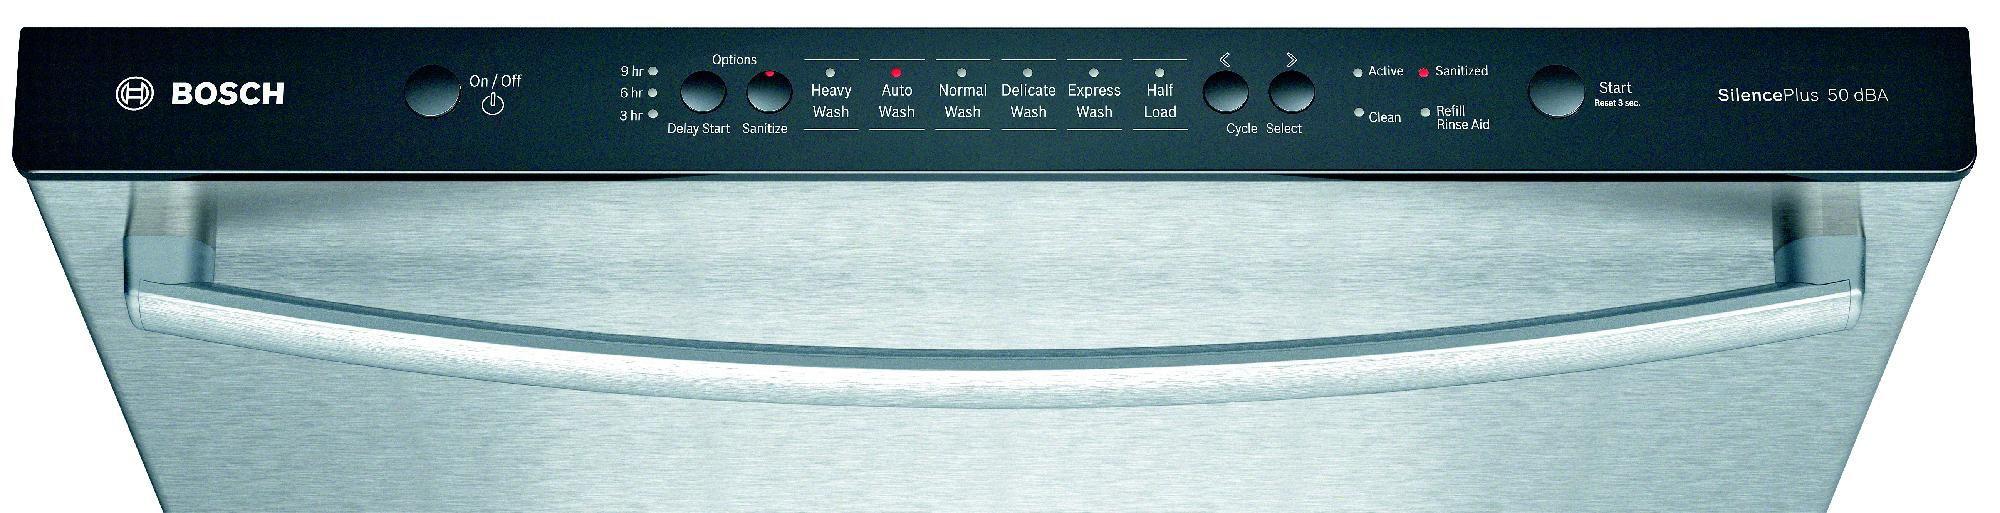 "Bosch 24"" Built-In Dishwasher - Stainless Steel"